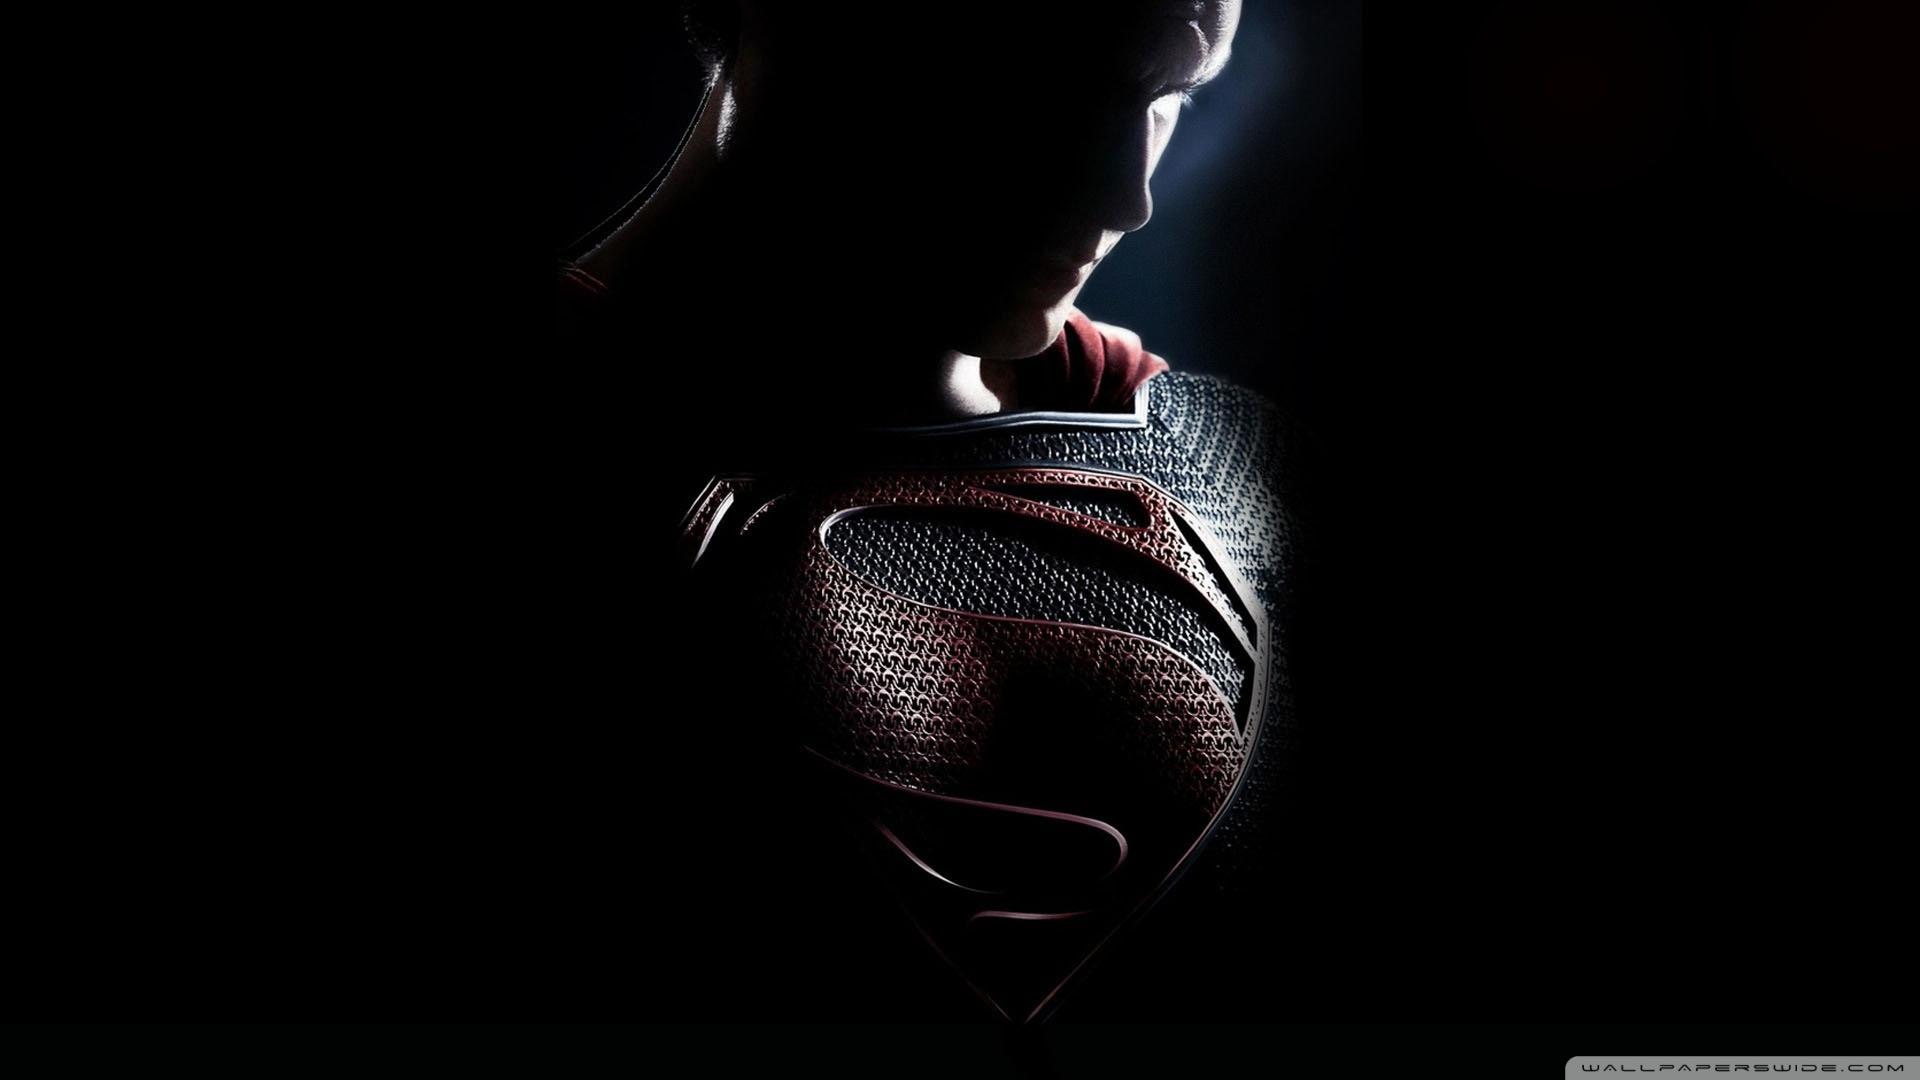 man_of_steel_2013_superman-wallpaper-1920x1080.jpg